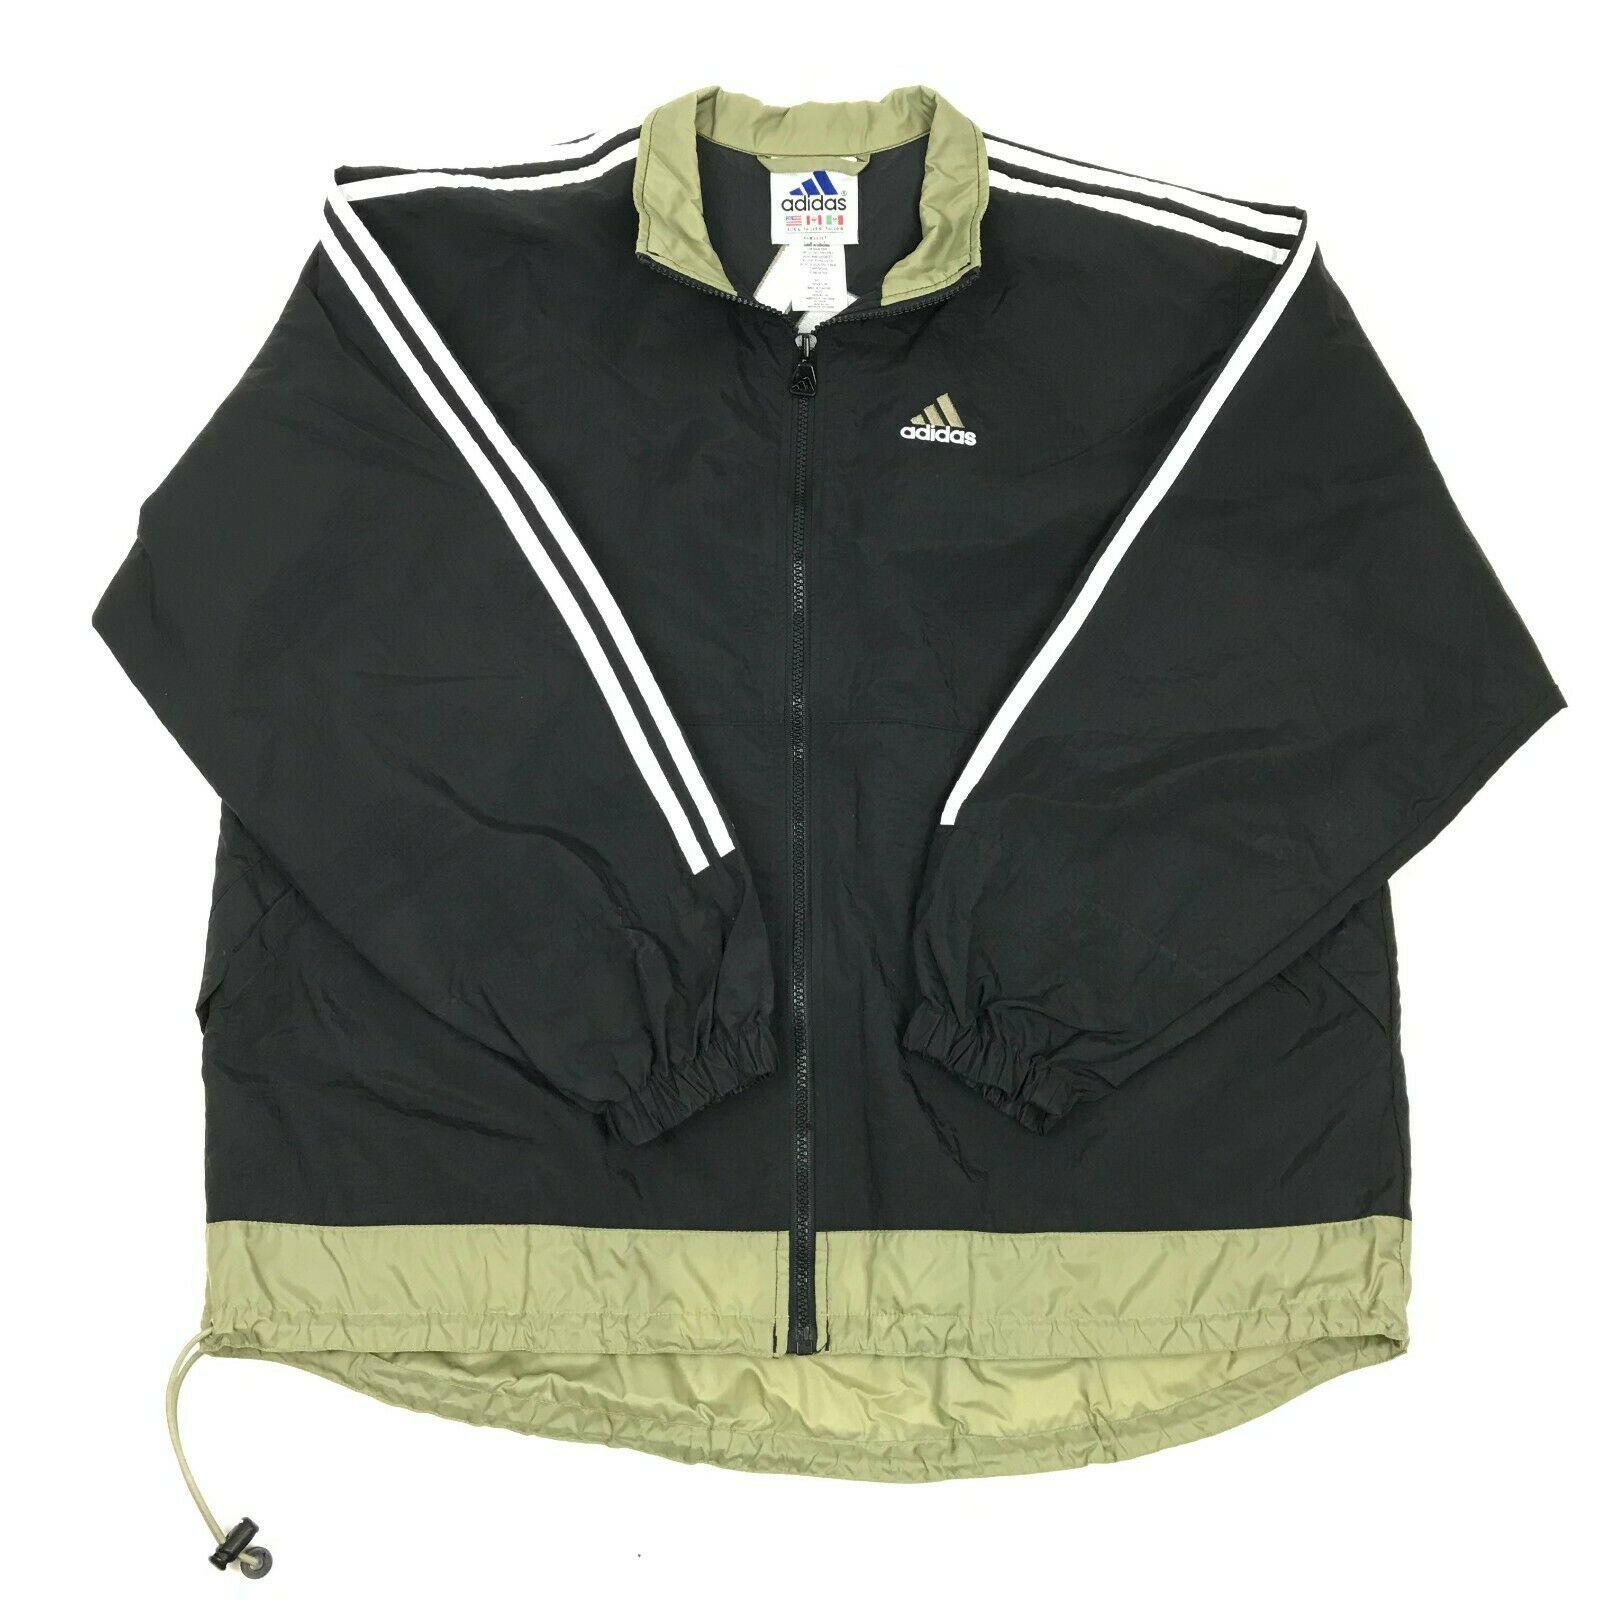 Vtg 90s ADIDAS Black Full Zip WINDBREAKER Nylon Swishy 3 stripe Jacket L Flag Tg - $29.70